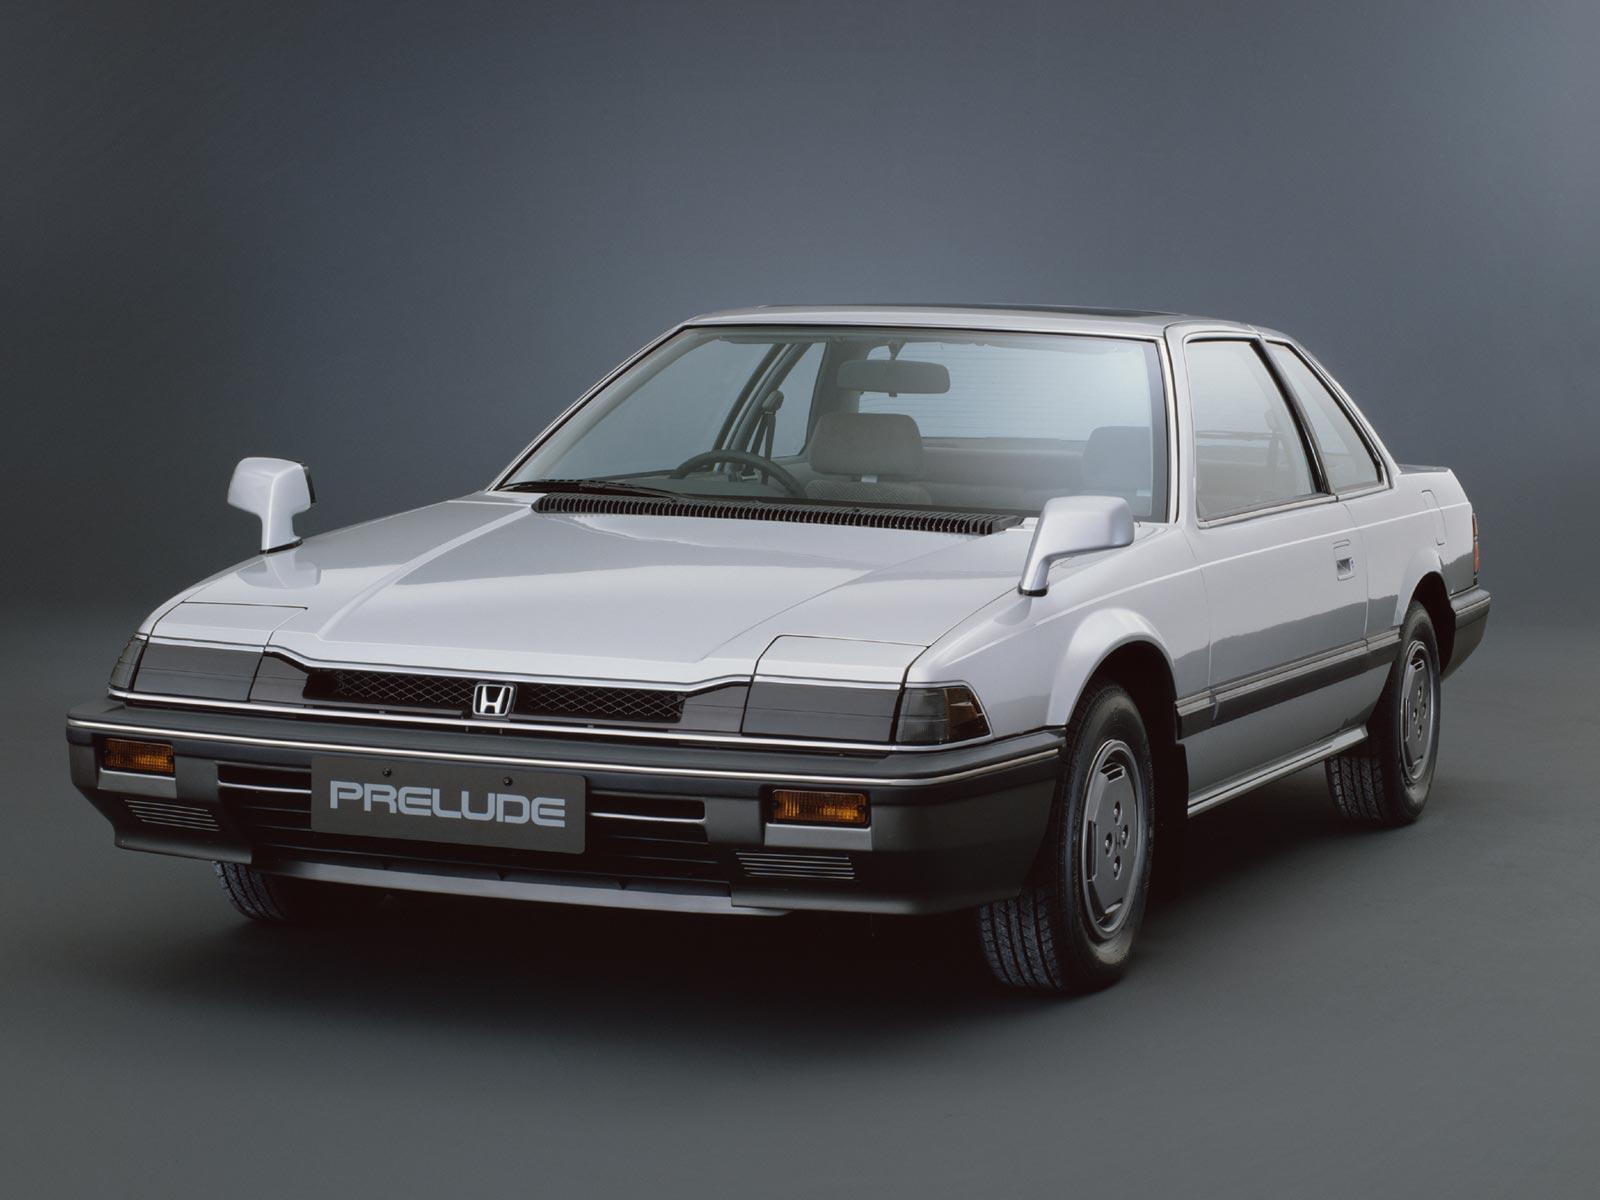 1982 1987 Honda Prelude Autoguru Katalog At